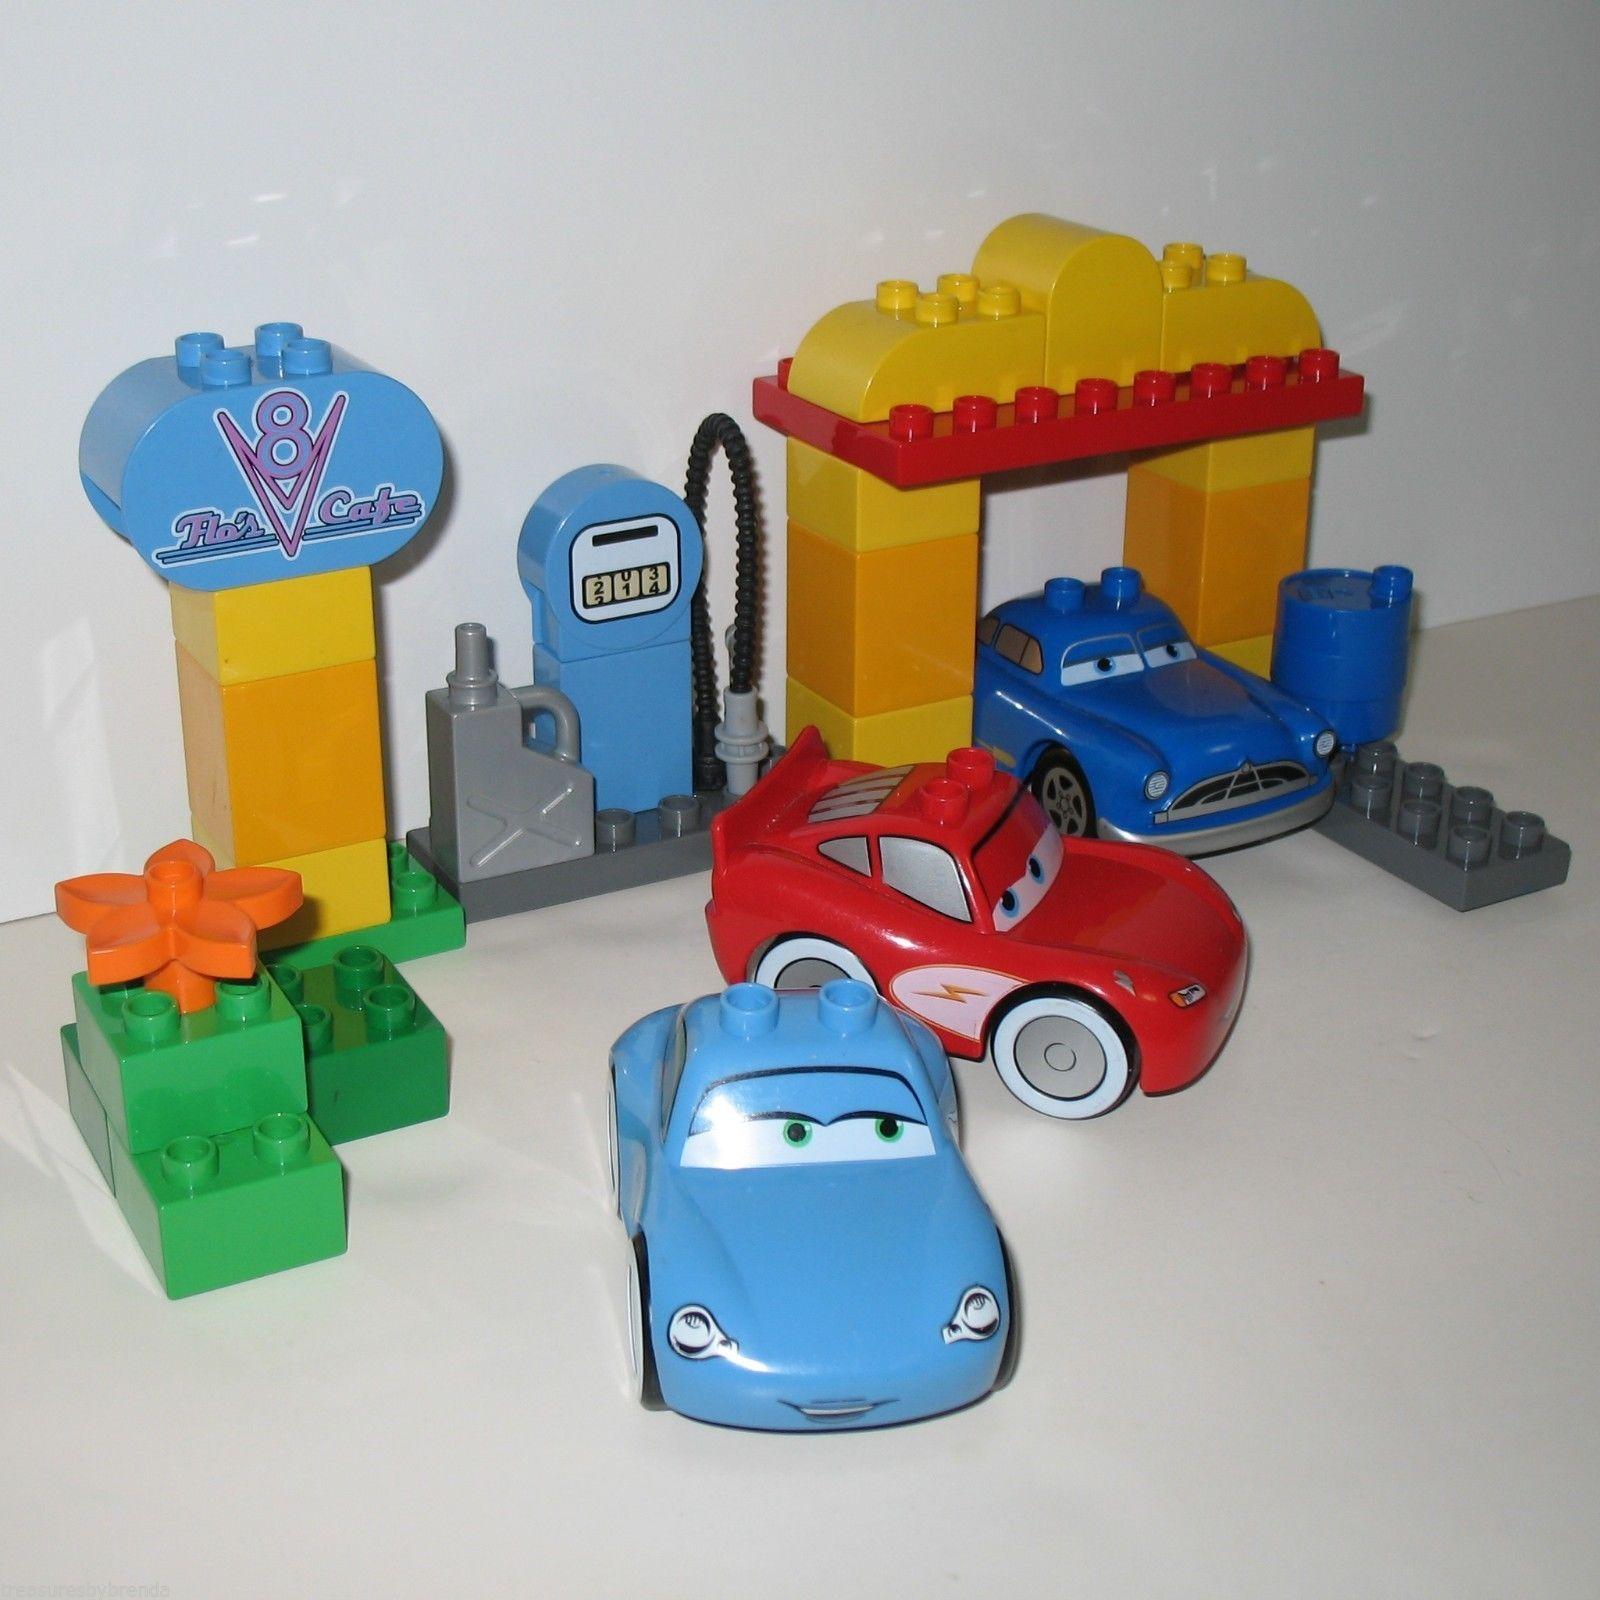 Rare Lego Duplo Set Flos V 8 Cafe Has Three Cars From Disneys